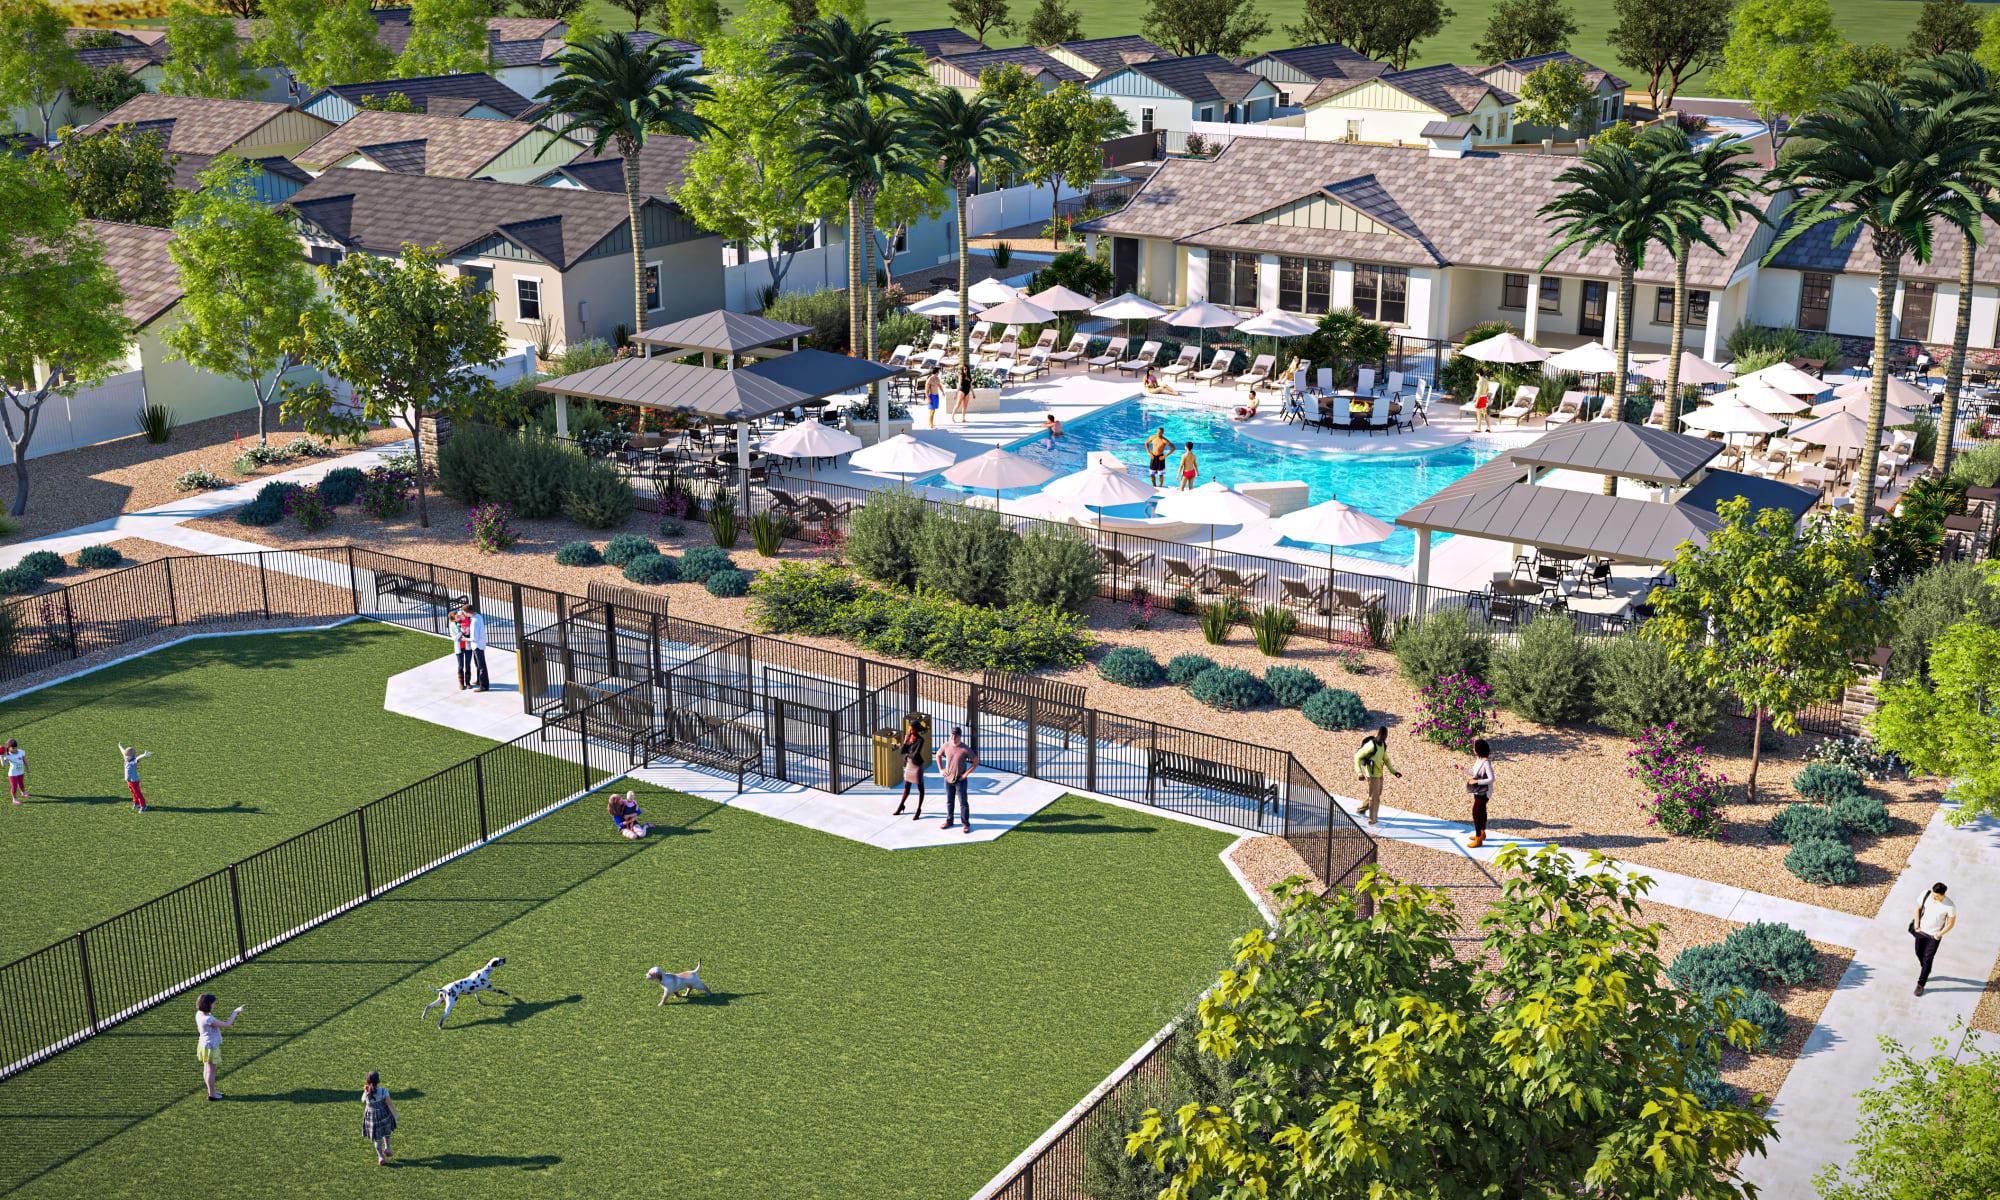 Resort-style pool & on-site dog park at Estia Surprise Farms in Surprise, Arizona